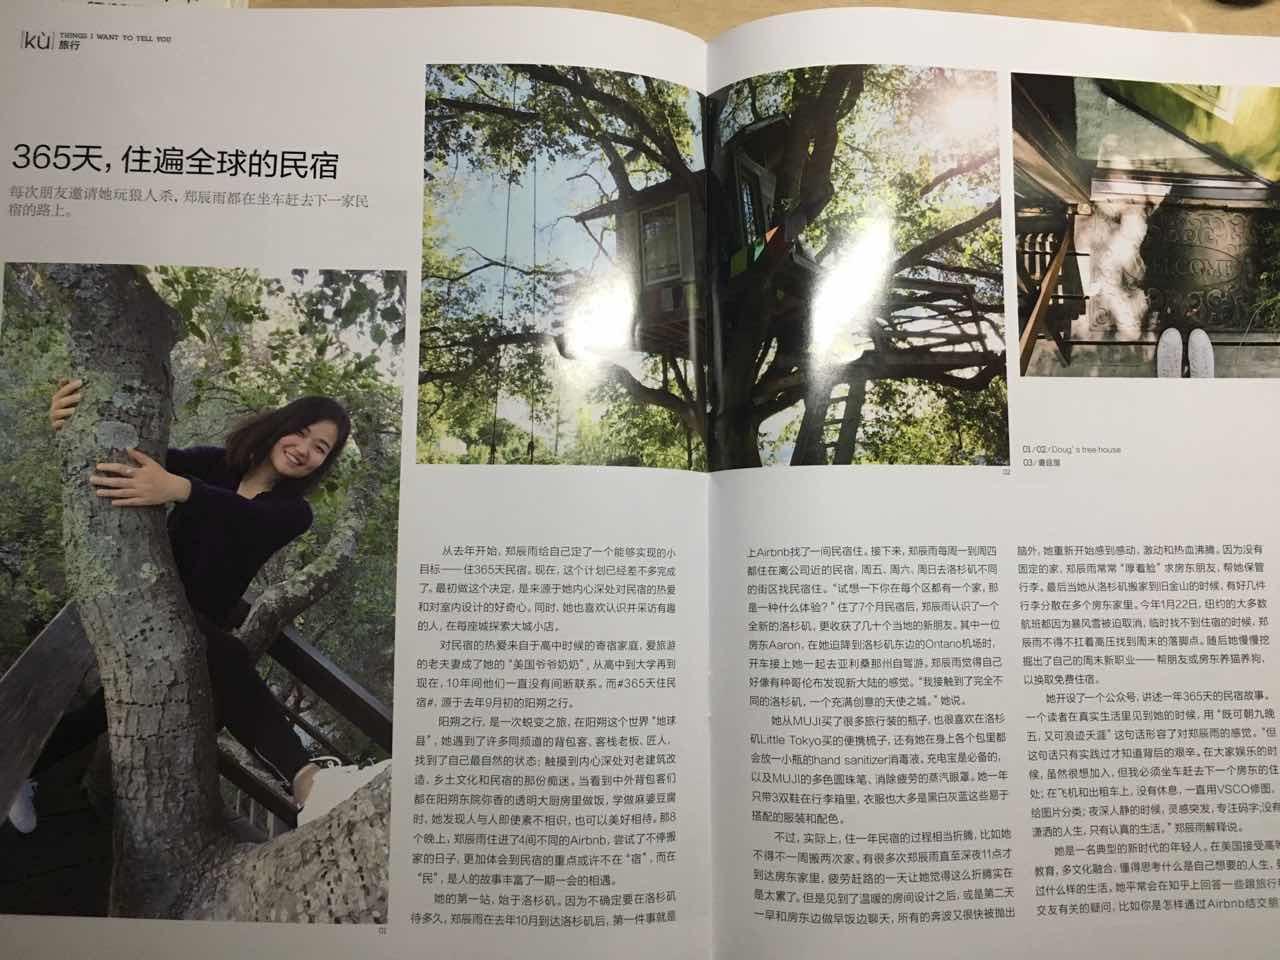 CBN Weekly 第一财经周刊 (800k circulation China's Bloomberg)